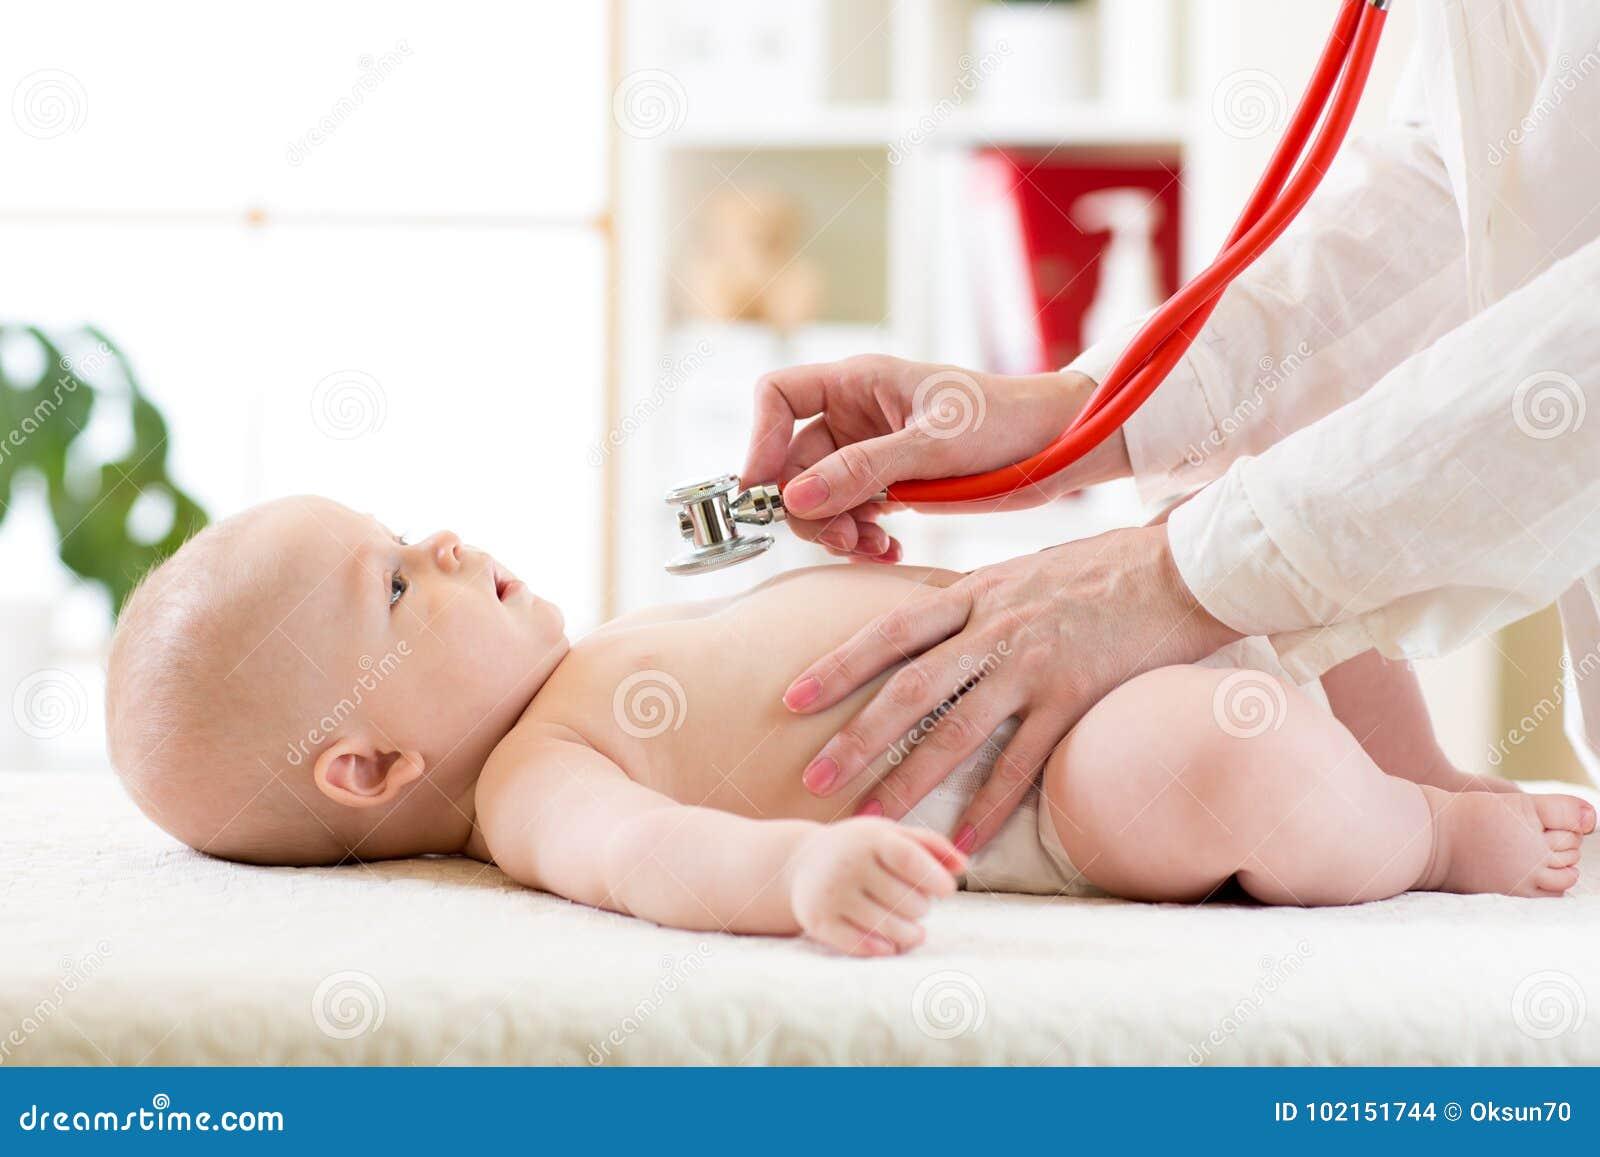 Stethoscope listening to baby`s heart beat